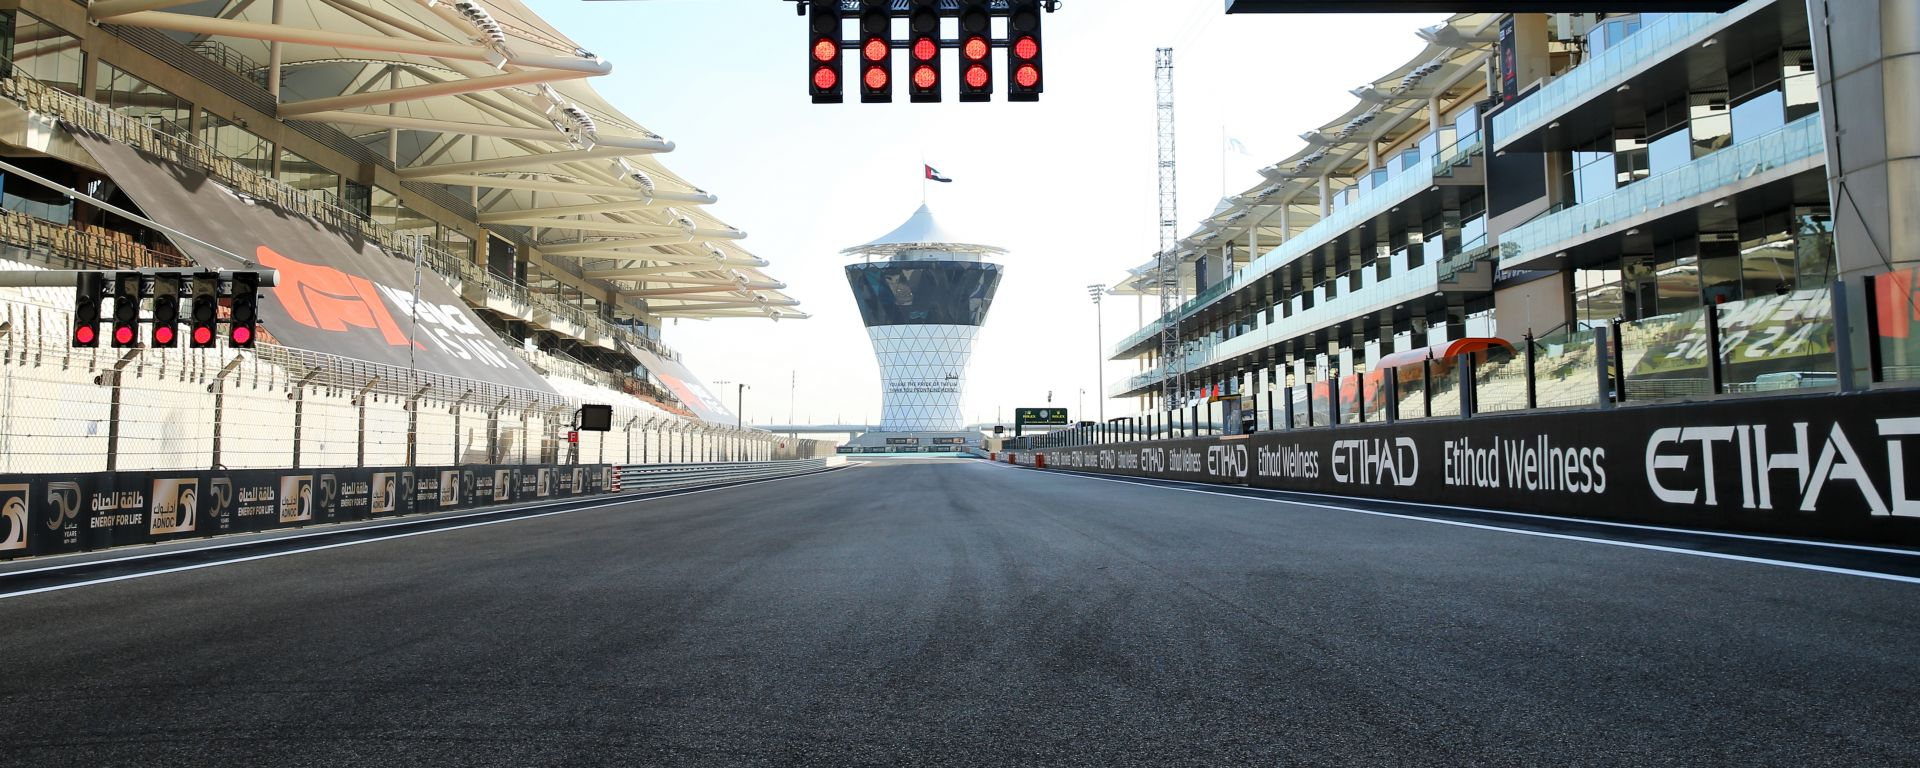 F1 GP Abu Dhabi 2020, Yas Marina: Atmosfera del circuito